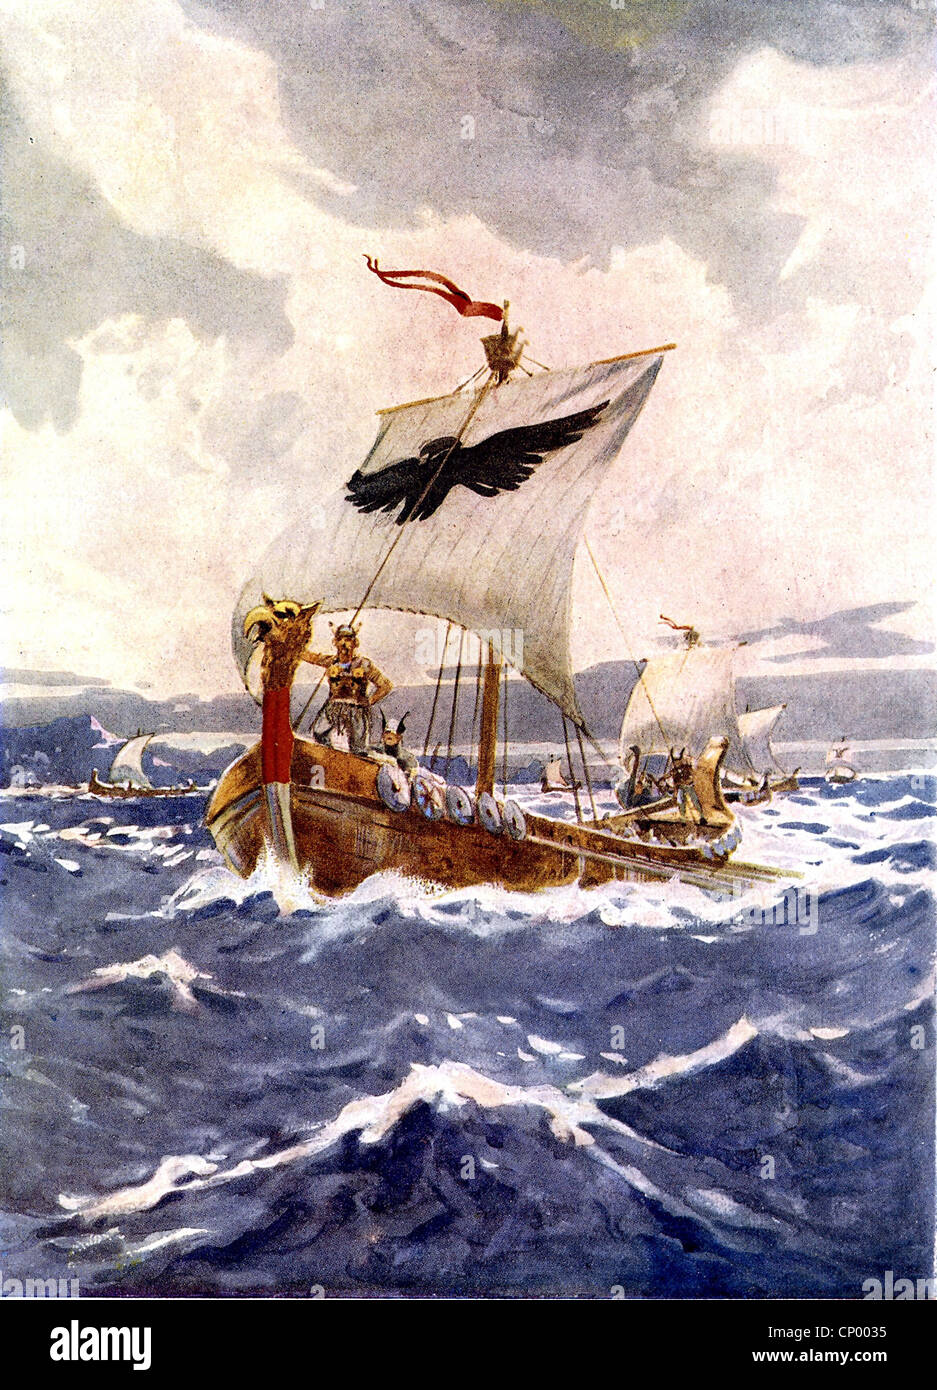 Idade Média, vikings, navio Viking, vela, pintura por Arco Webb, histórico, histórico, navios, barco, Imagens de Stock